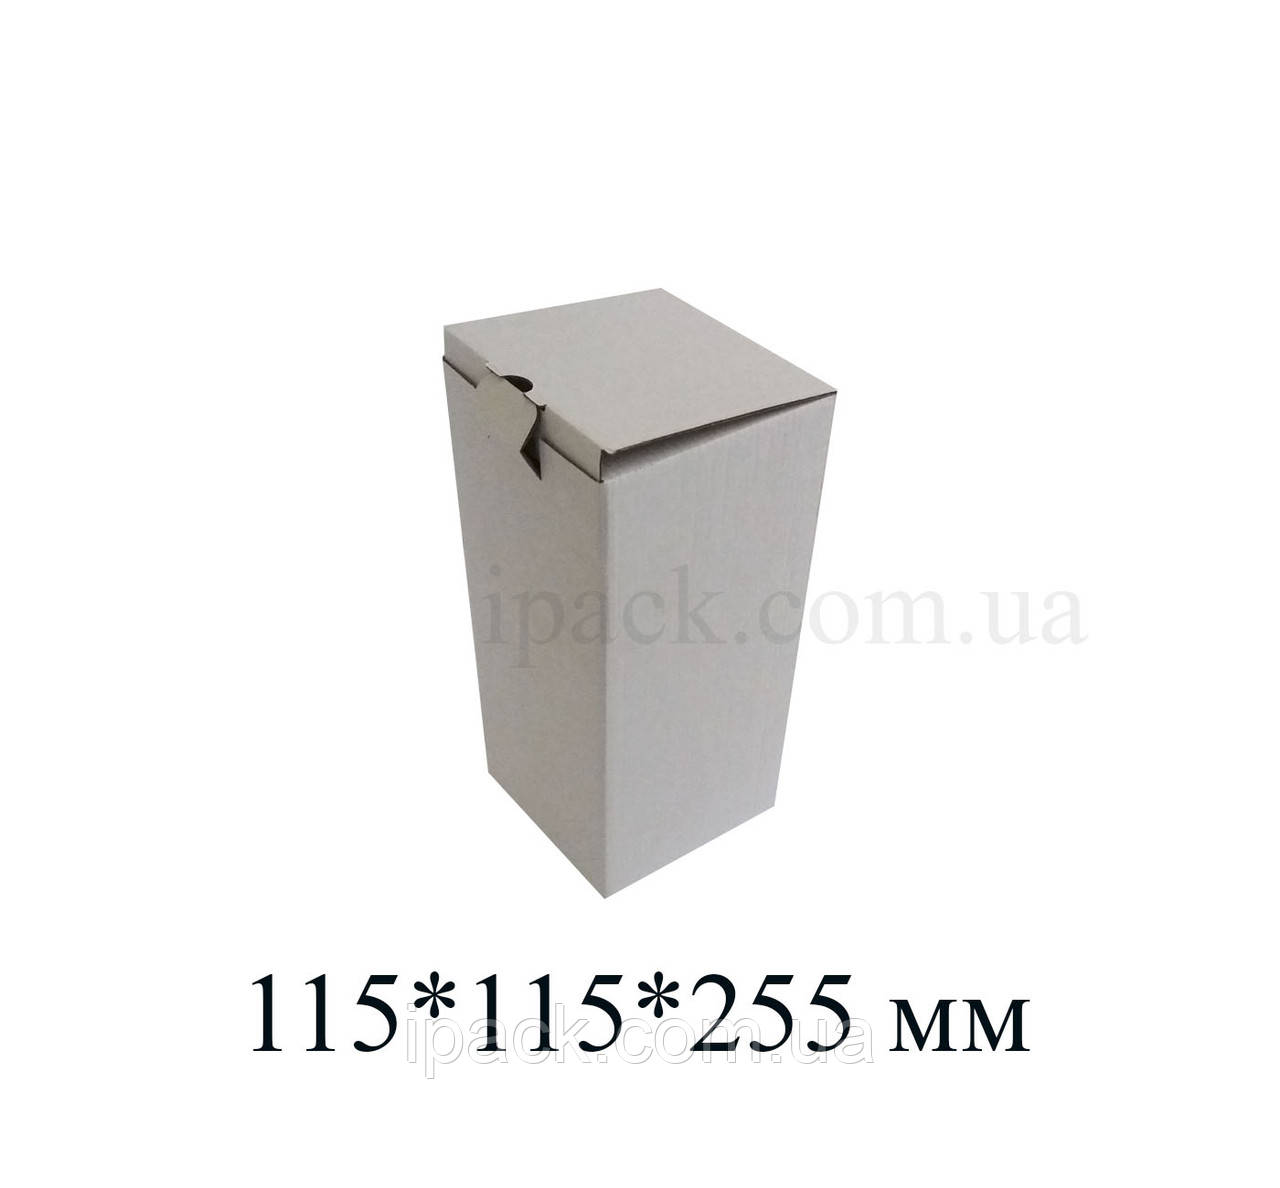 Коробка картонная самосборная, 115*115*255, мм, белая, микрогофрокартон